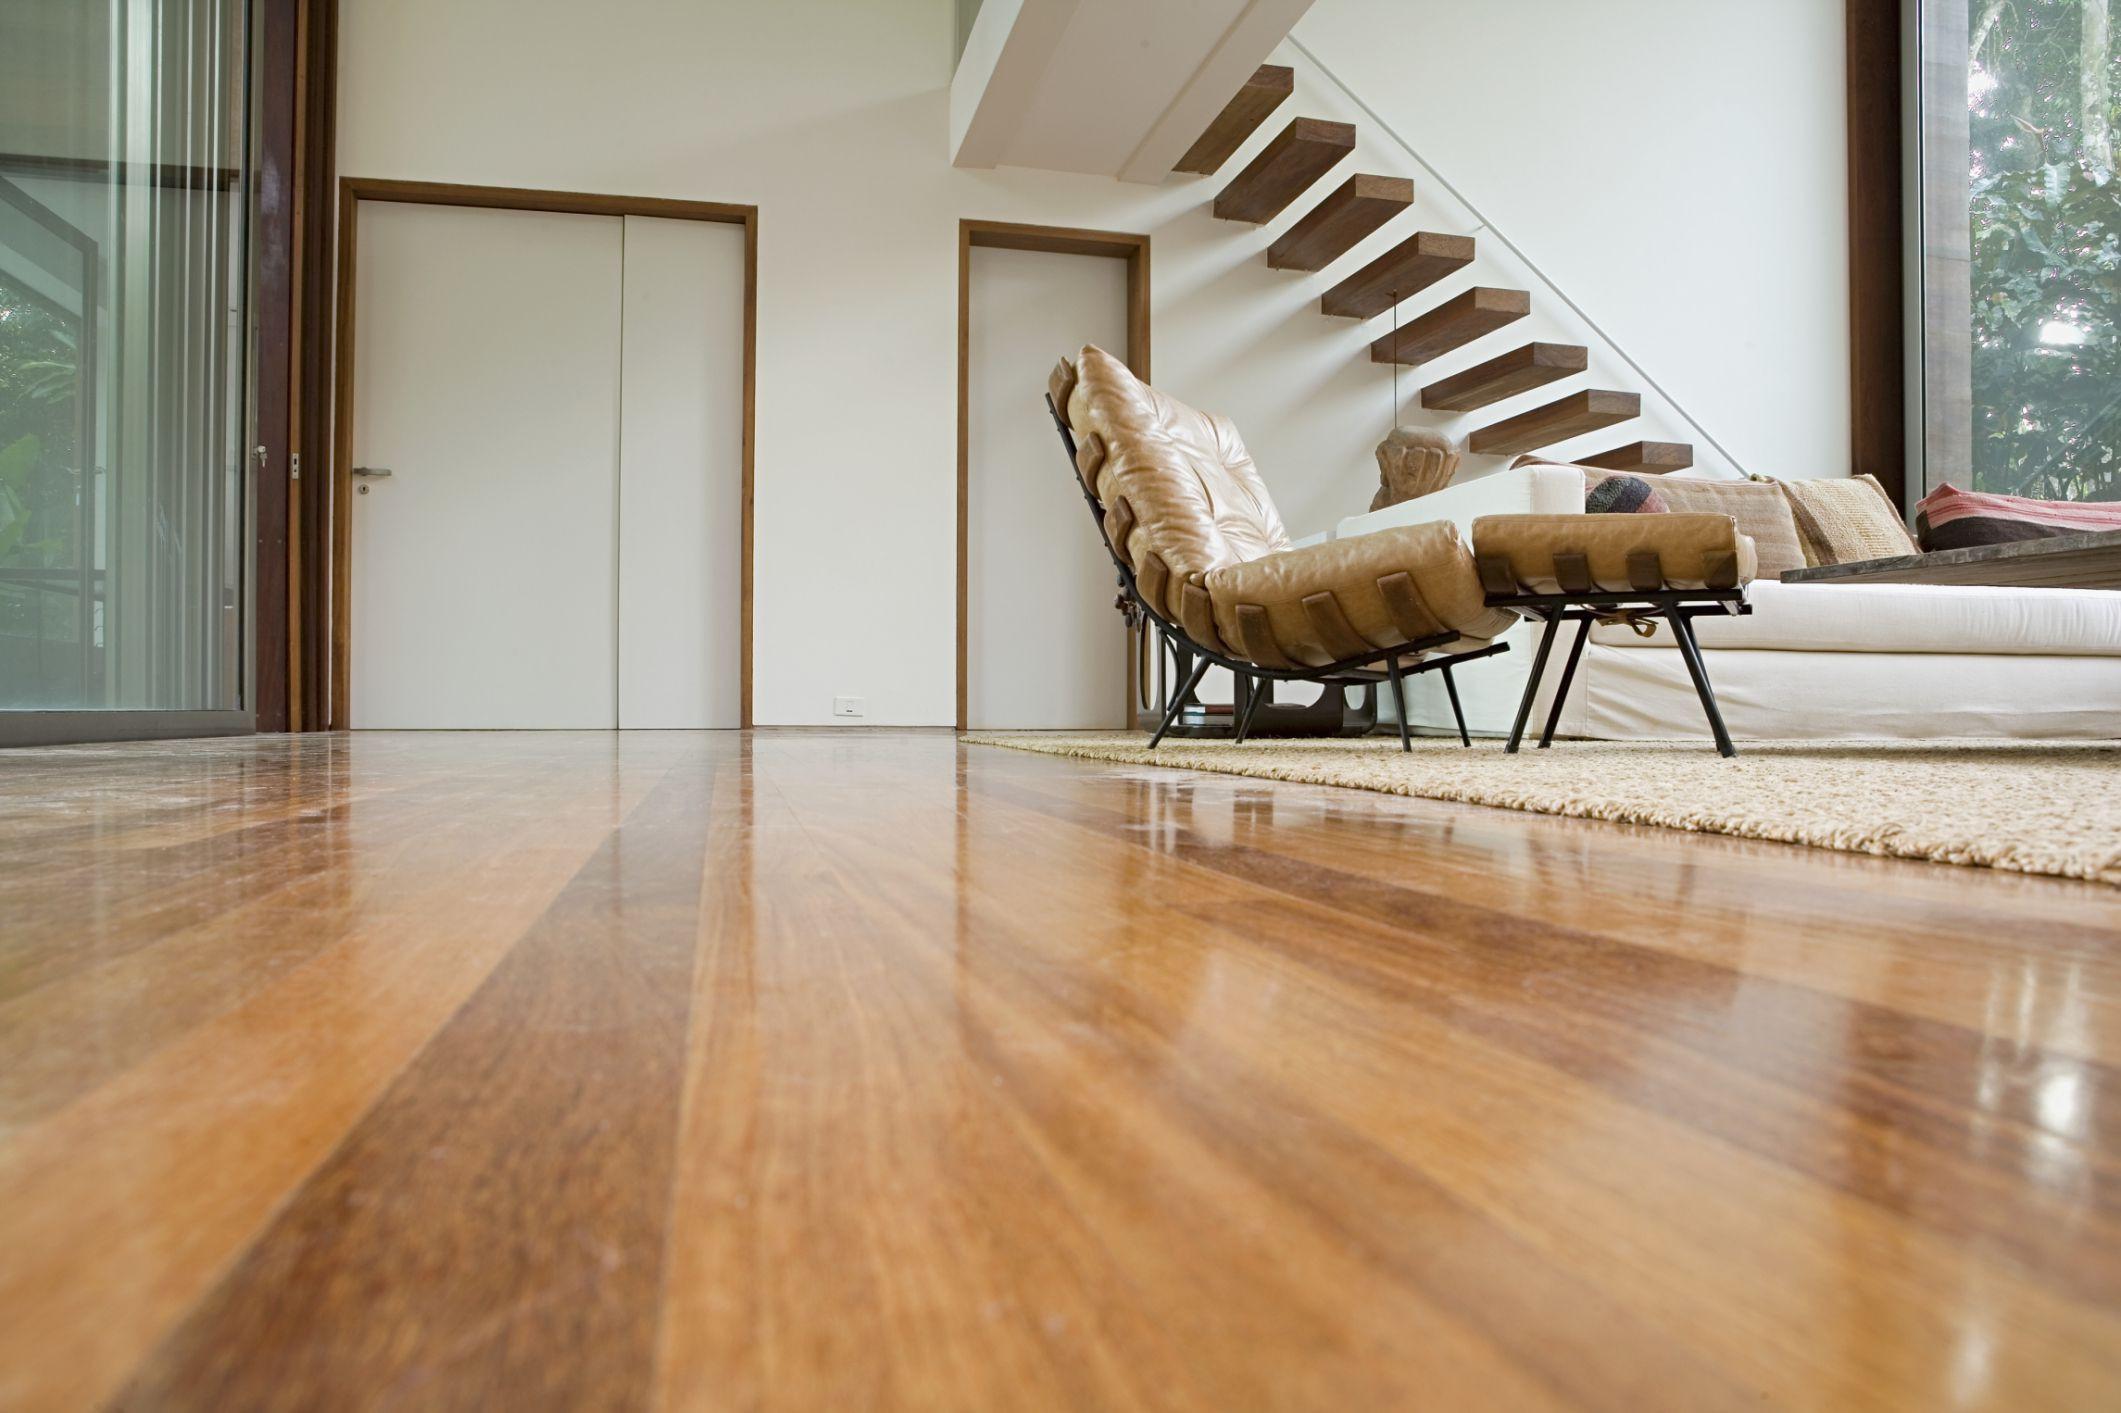 best hardwood floor finish for kitchen of engineered wood flooring vs solid wood flooring in 200571260 001 highres 56a49dec5f9b58b7d0d7dc1e